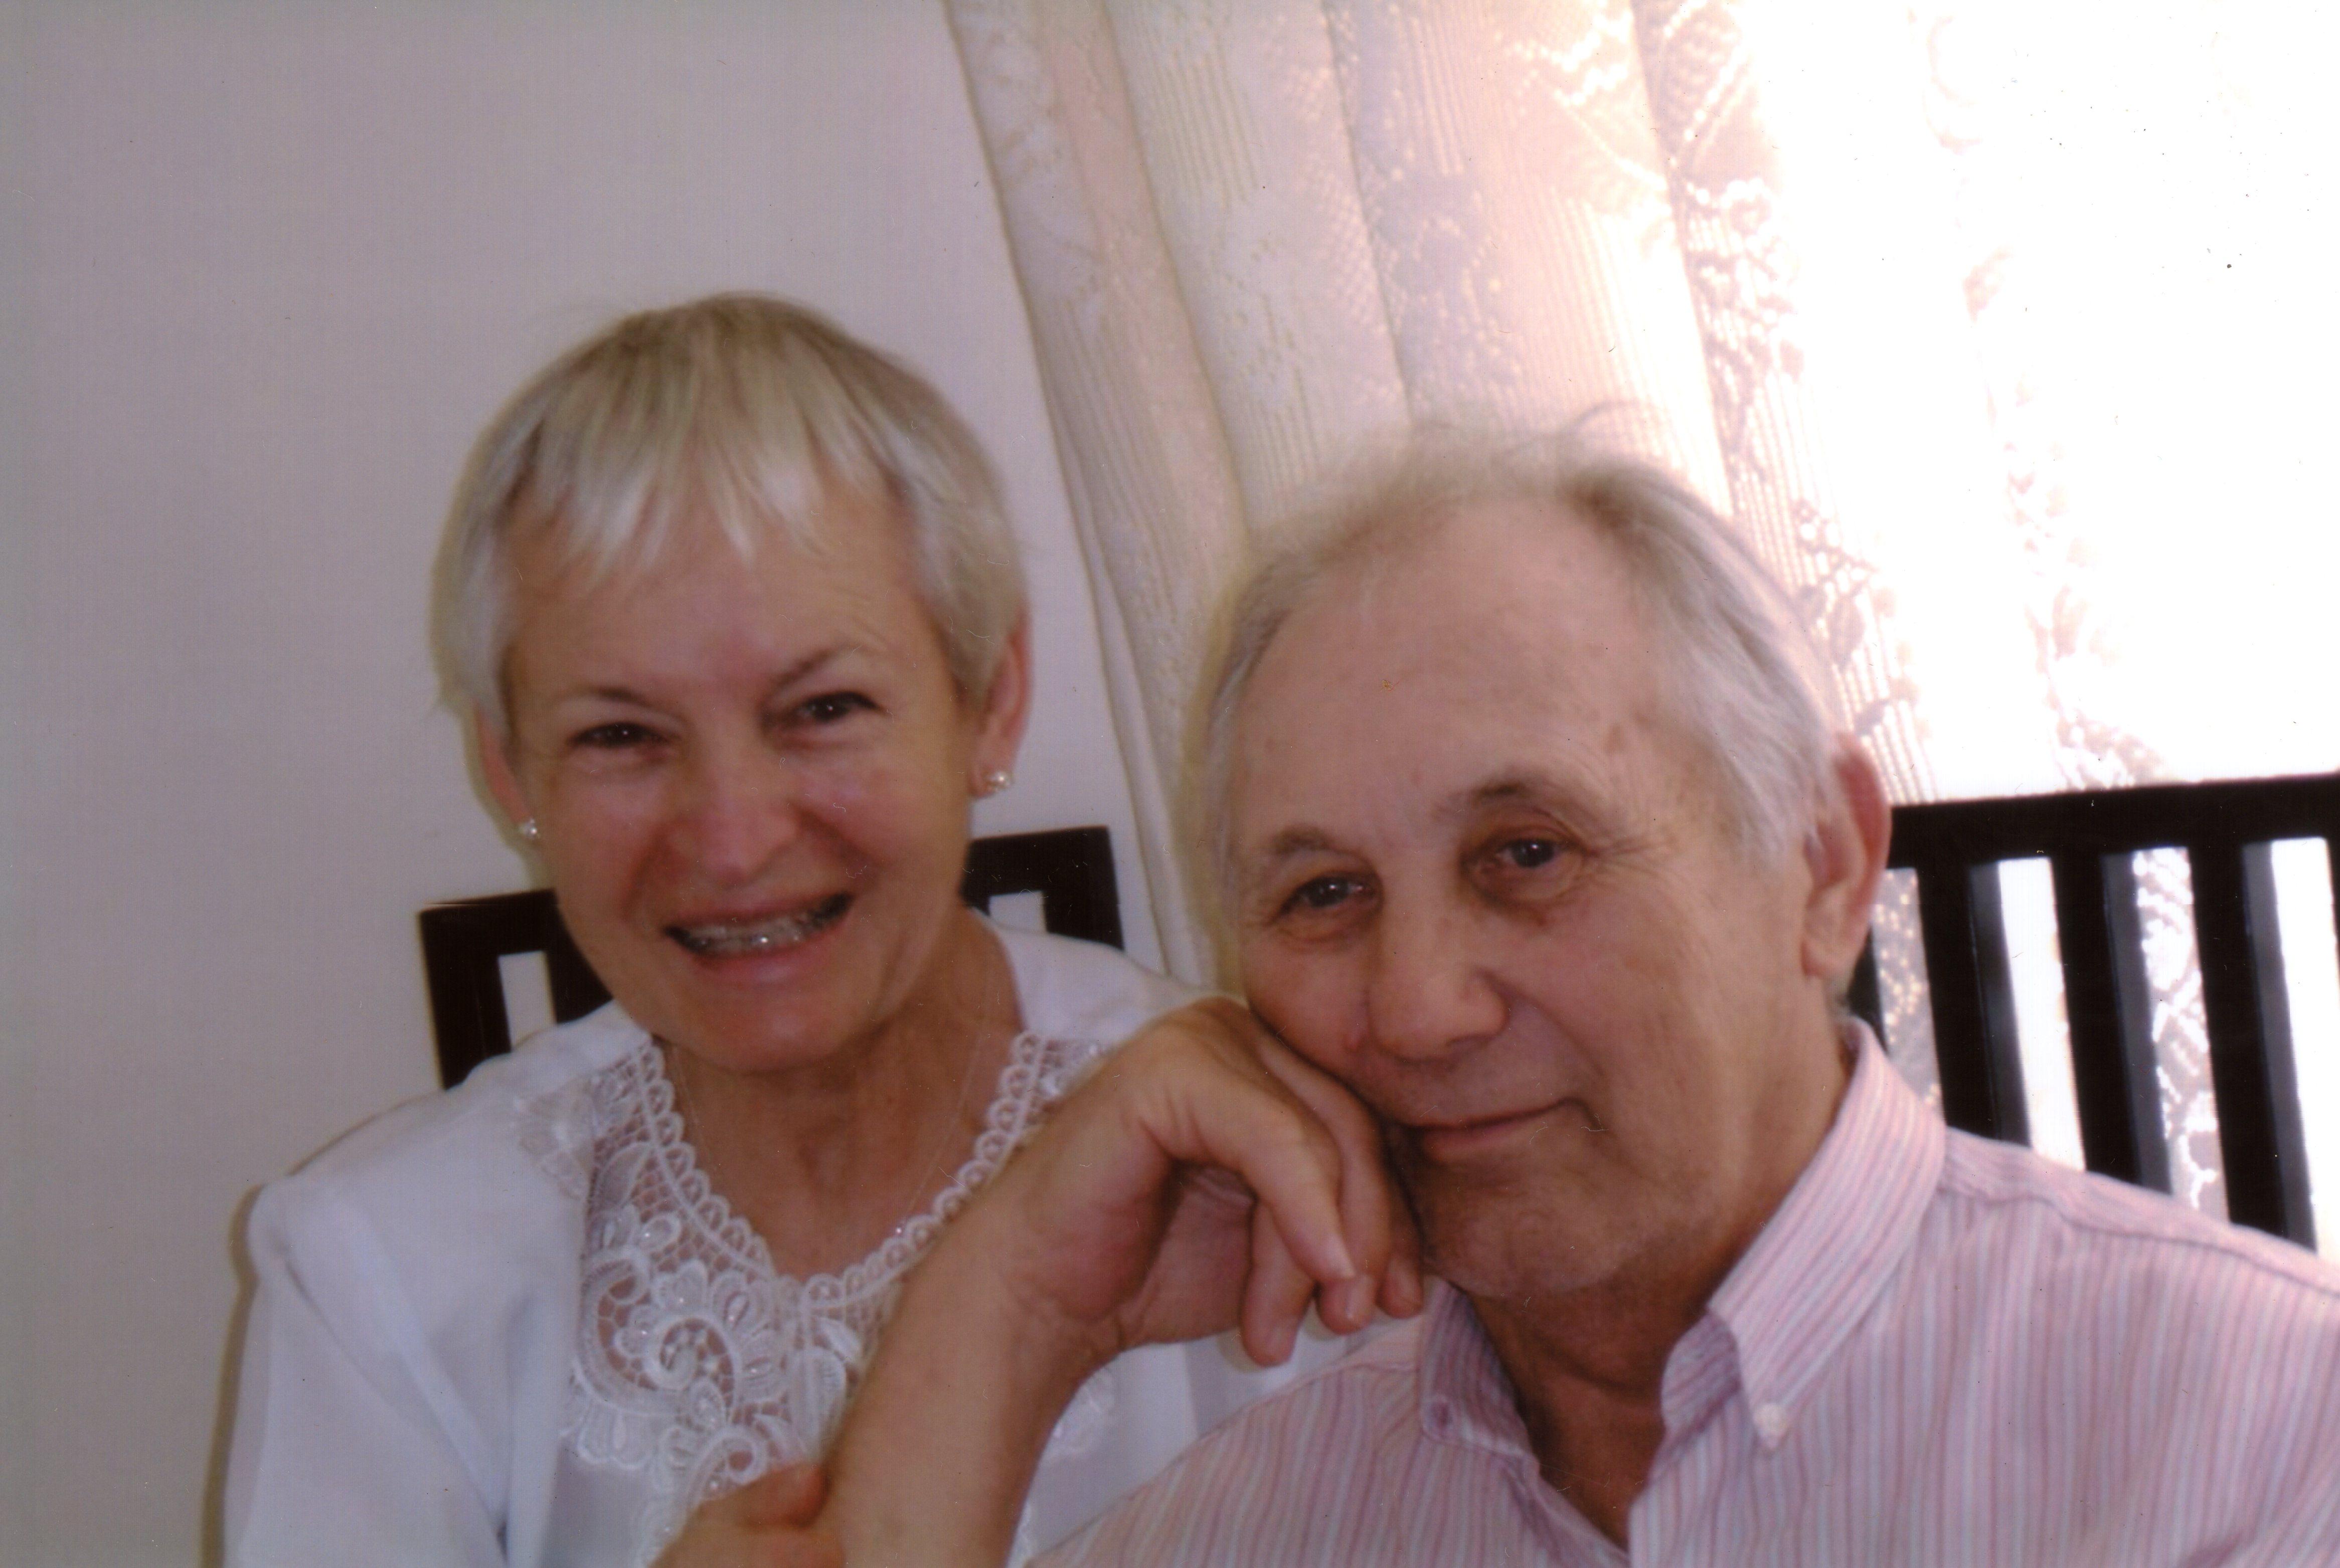 Bethy - Jeugd & Familie - epson -306